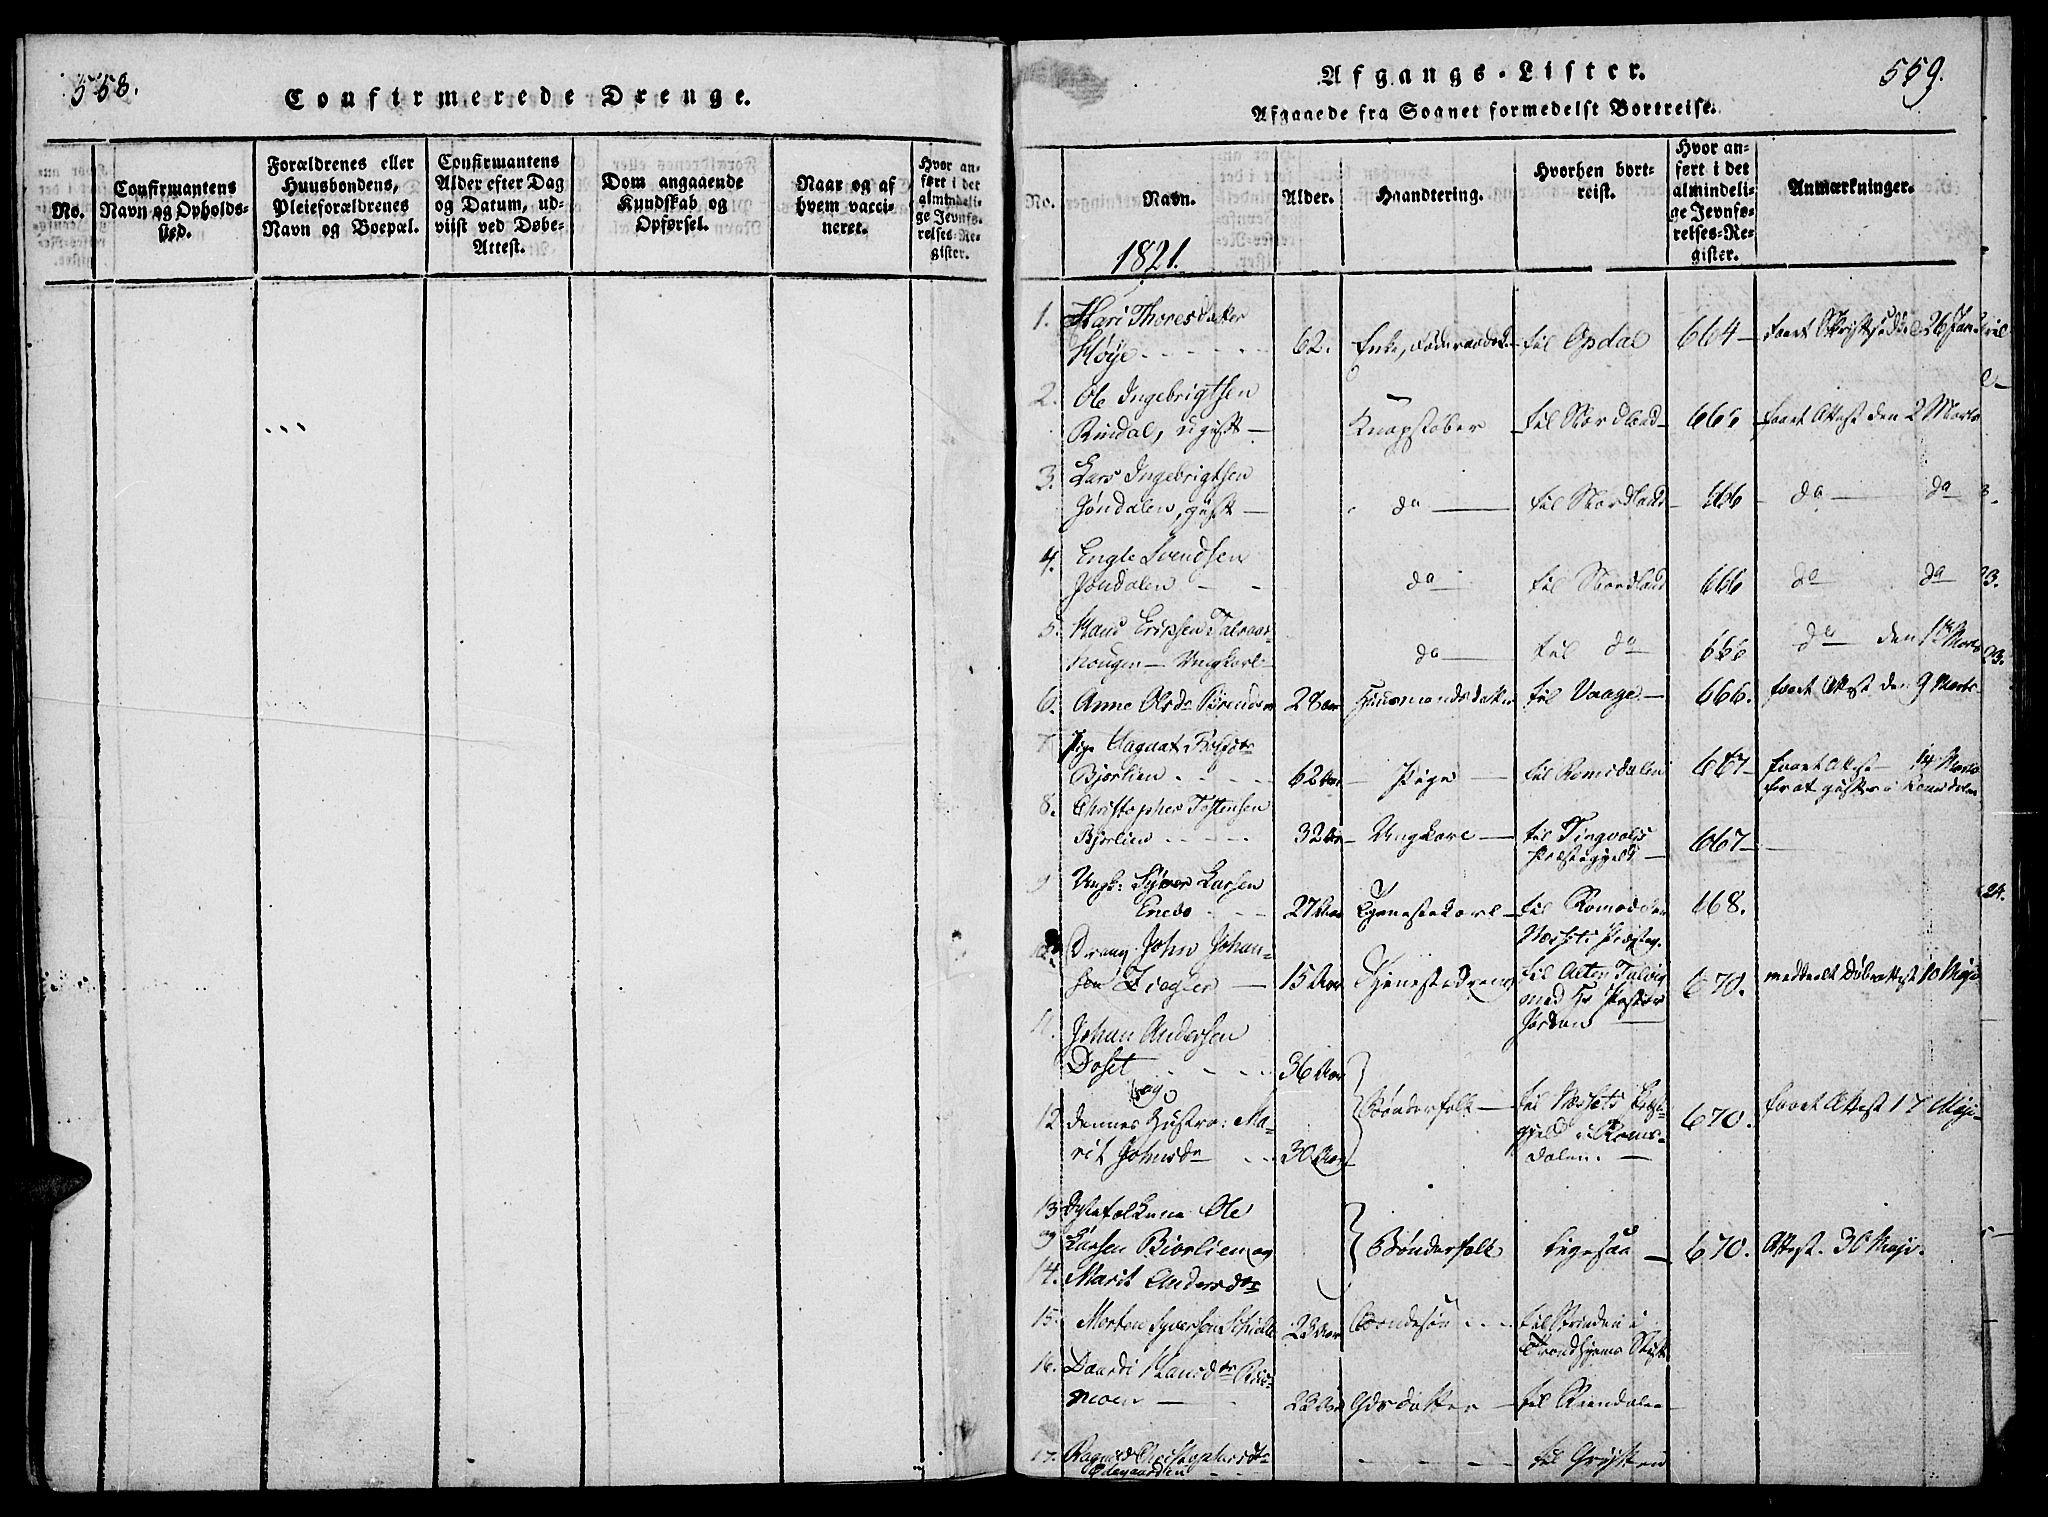 SAH, Lesja prestekontor, Ministerialbok nr. 4, 1820-1829, s. 558-559